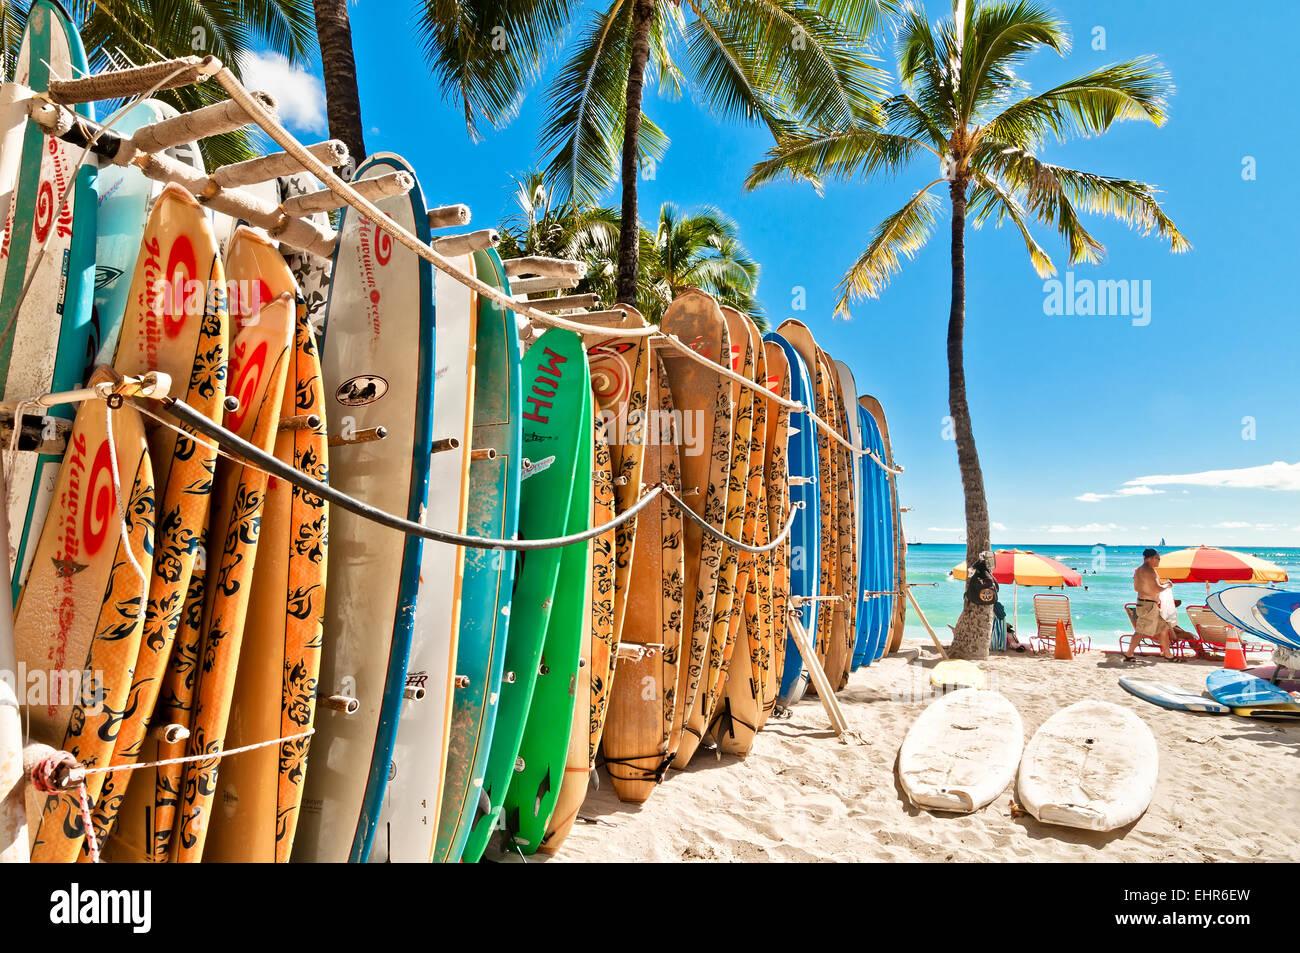 Honolulu, HI, USA - September 7, 2013: Surfboards lined up in the rack at famous Waikiki Beach in Honolulu. Oahu, - Stock Image